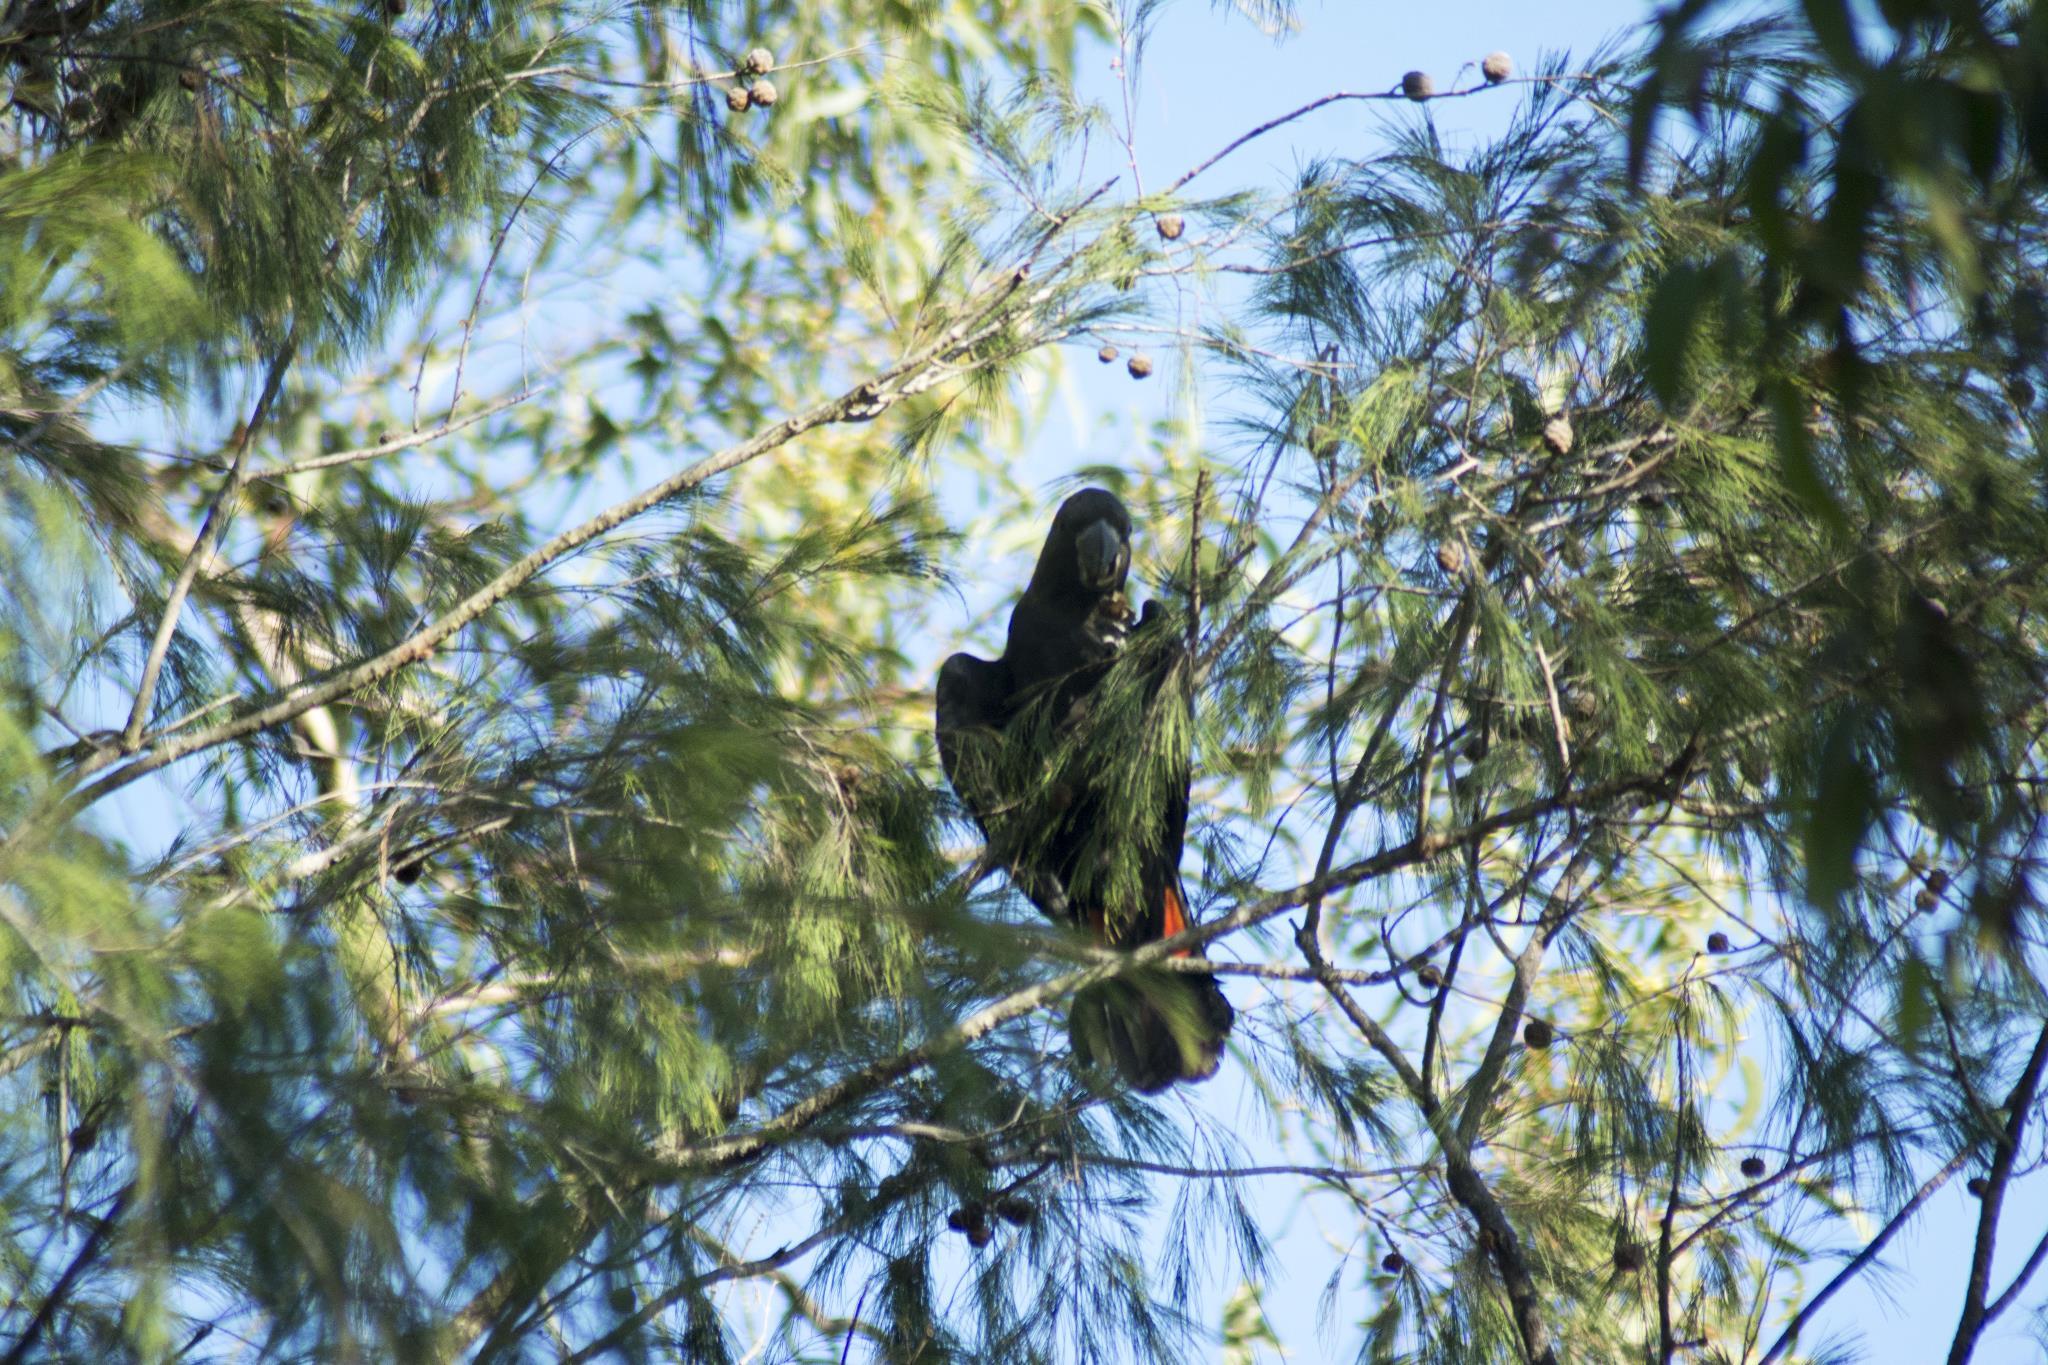 Glossy Black Cockatoo feeding near the Nursery